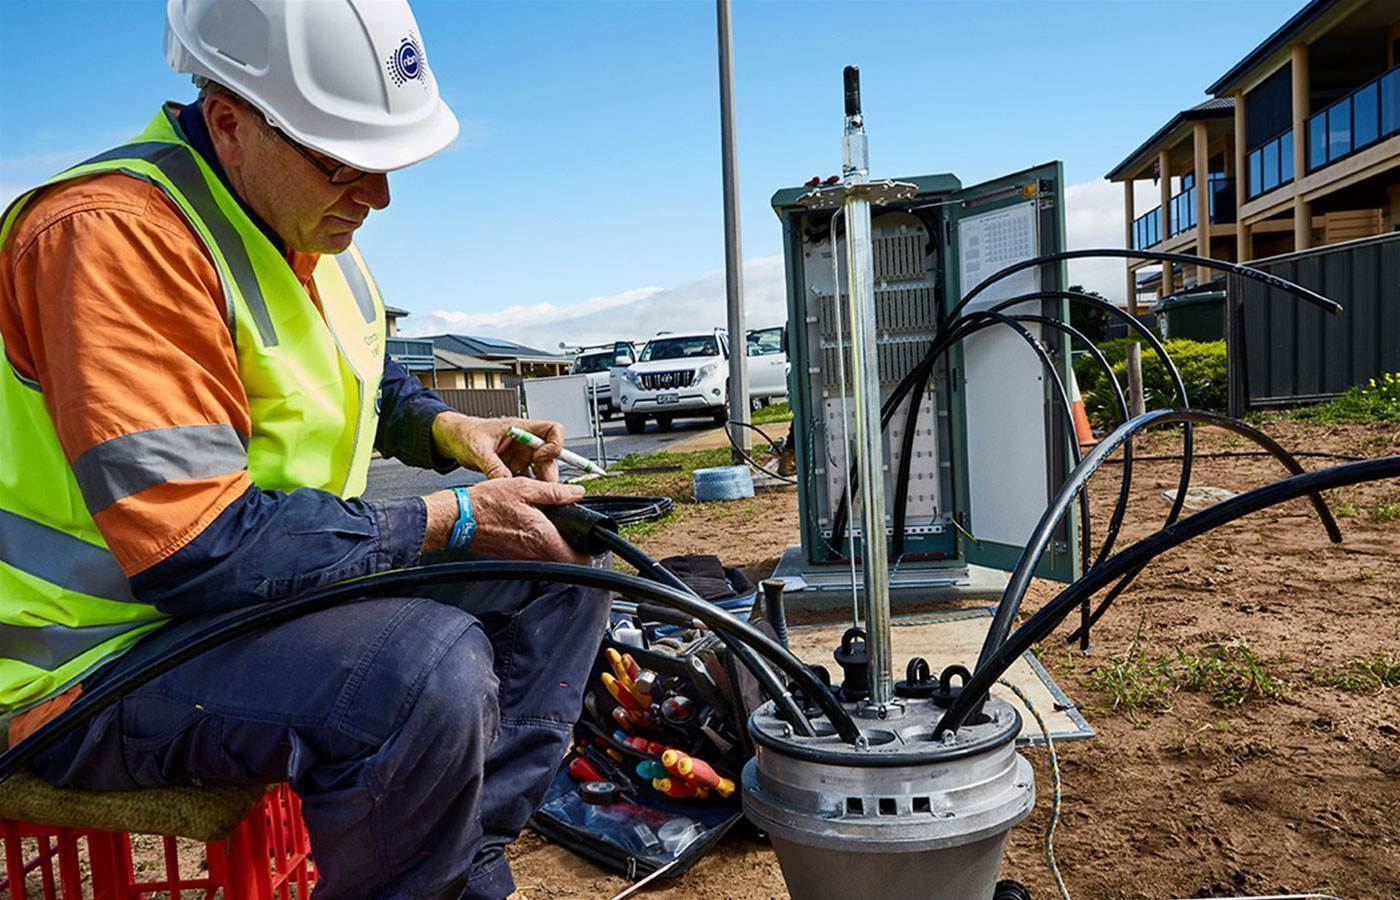 NBN Co reveals uneven spread of 50Mbps-capable premises